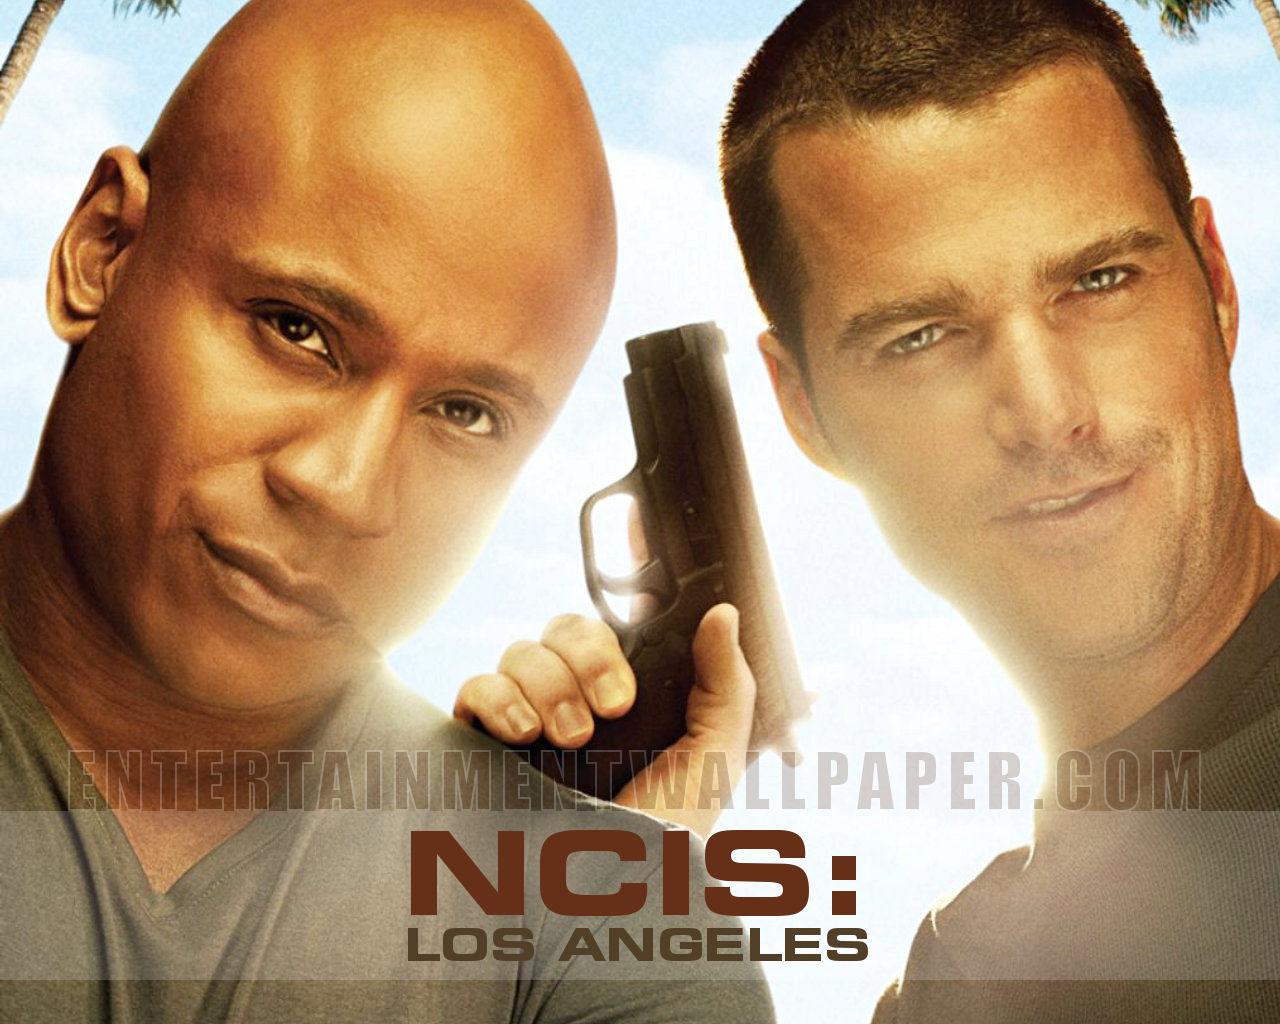 NCIS- Los Angeles